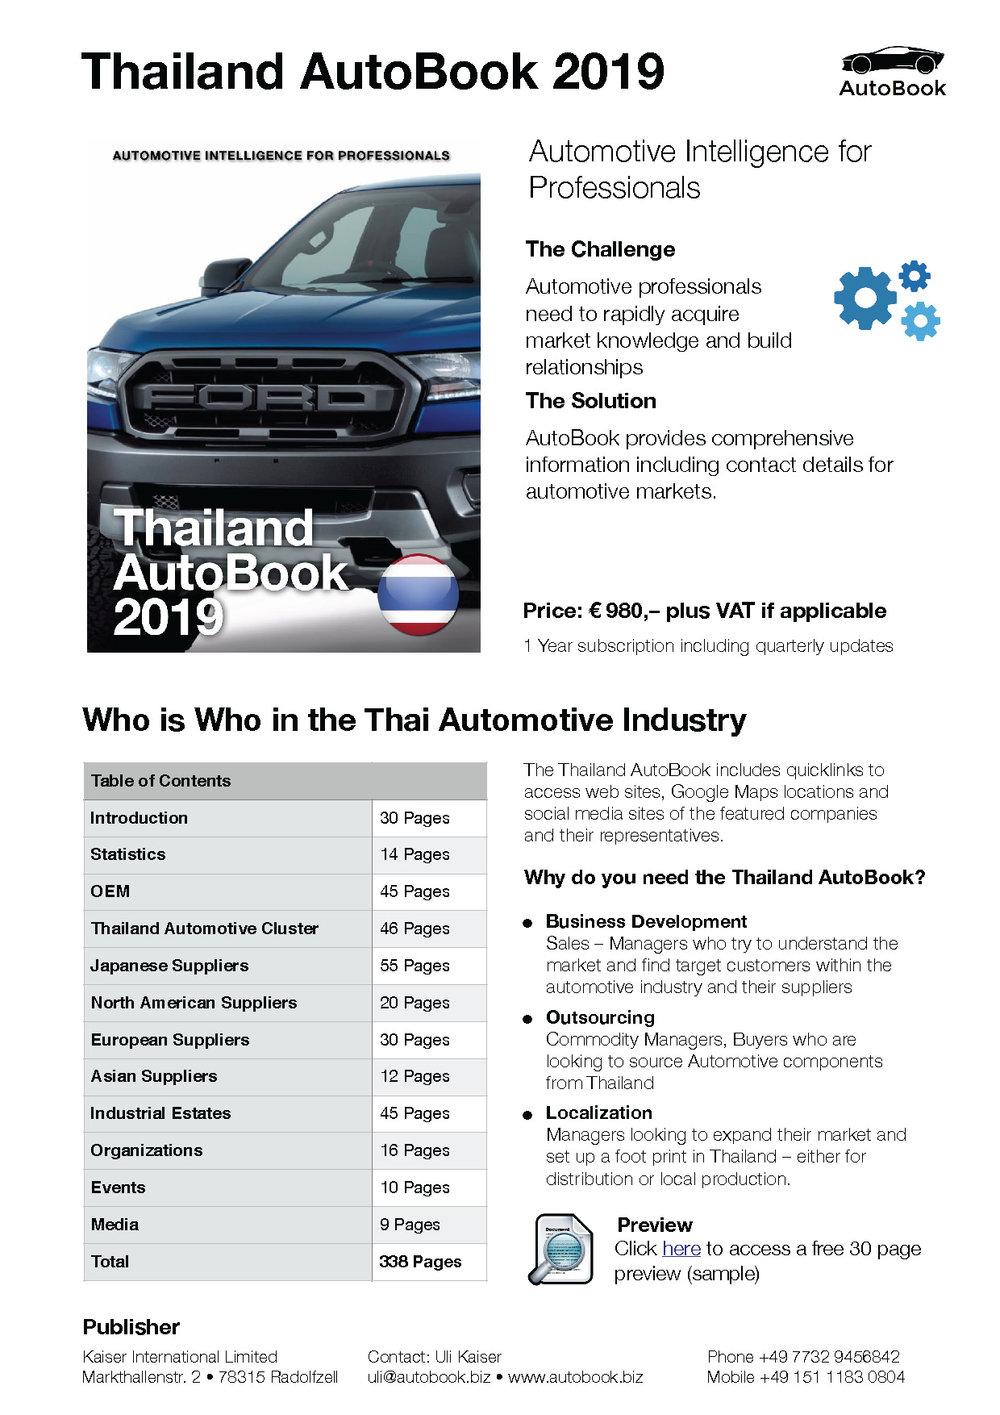 Thailand AutoBook 2019 Datasheet.jpg